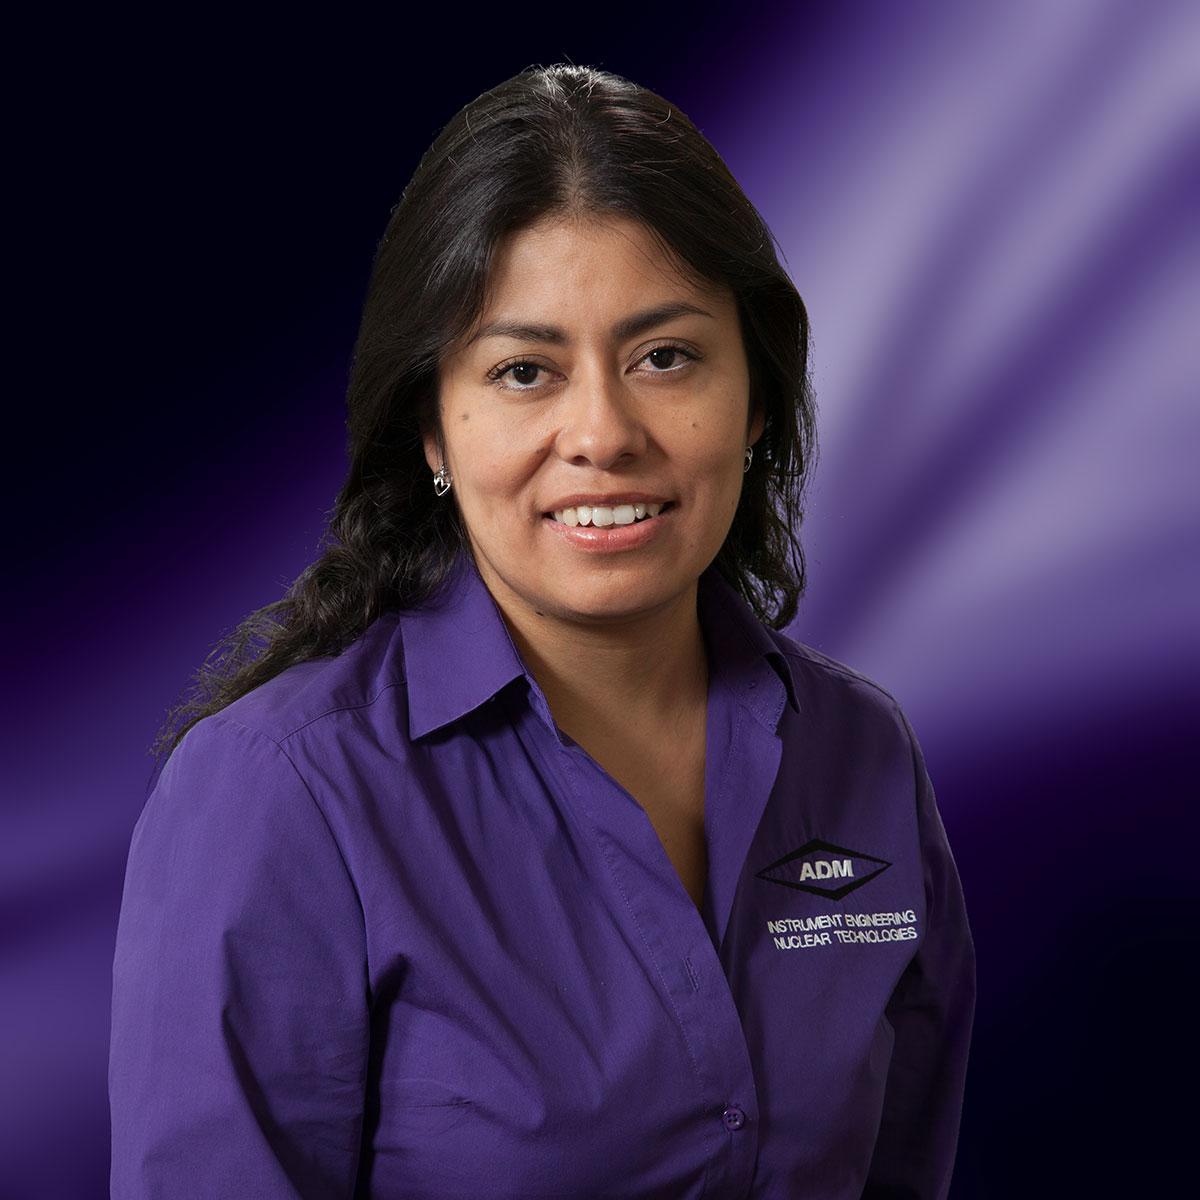 Tatiana Rincon-Cruz